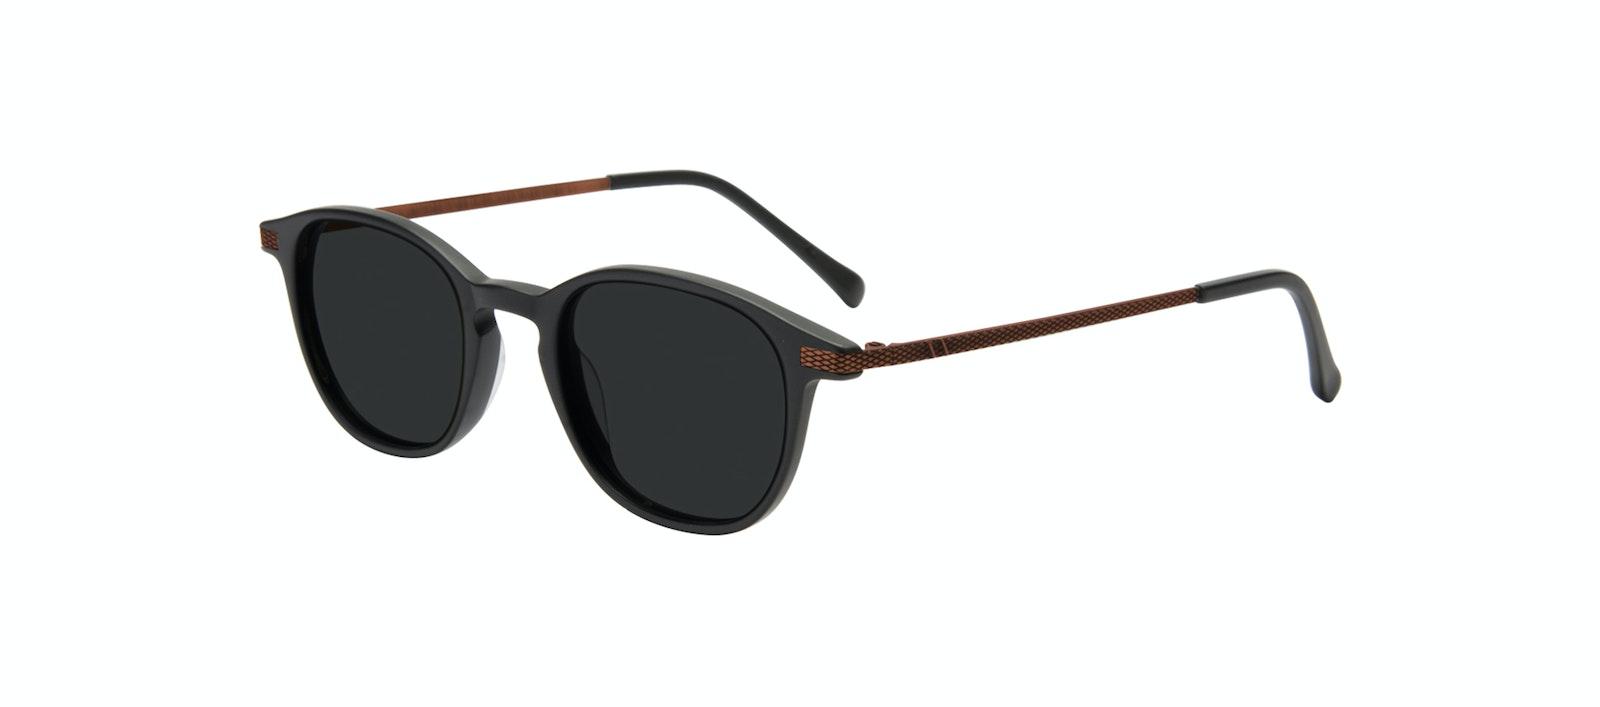 Affordable Fashion Glasses Round Sunglasses Men Tux Onyx Matte Tilt